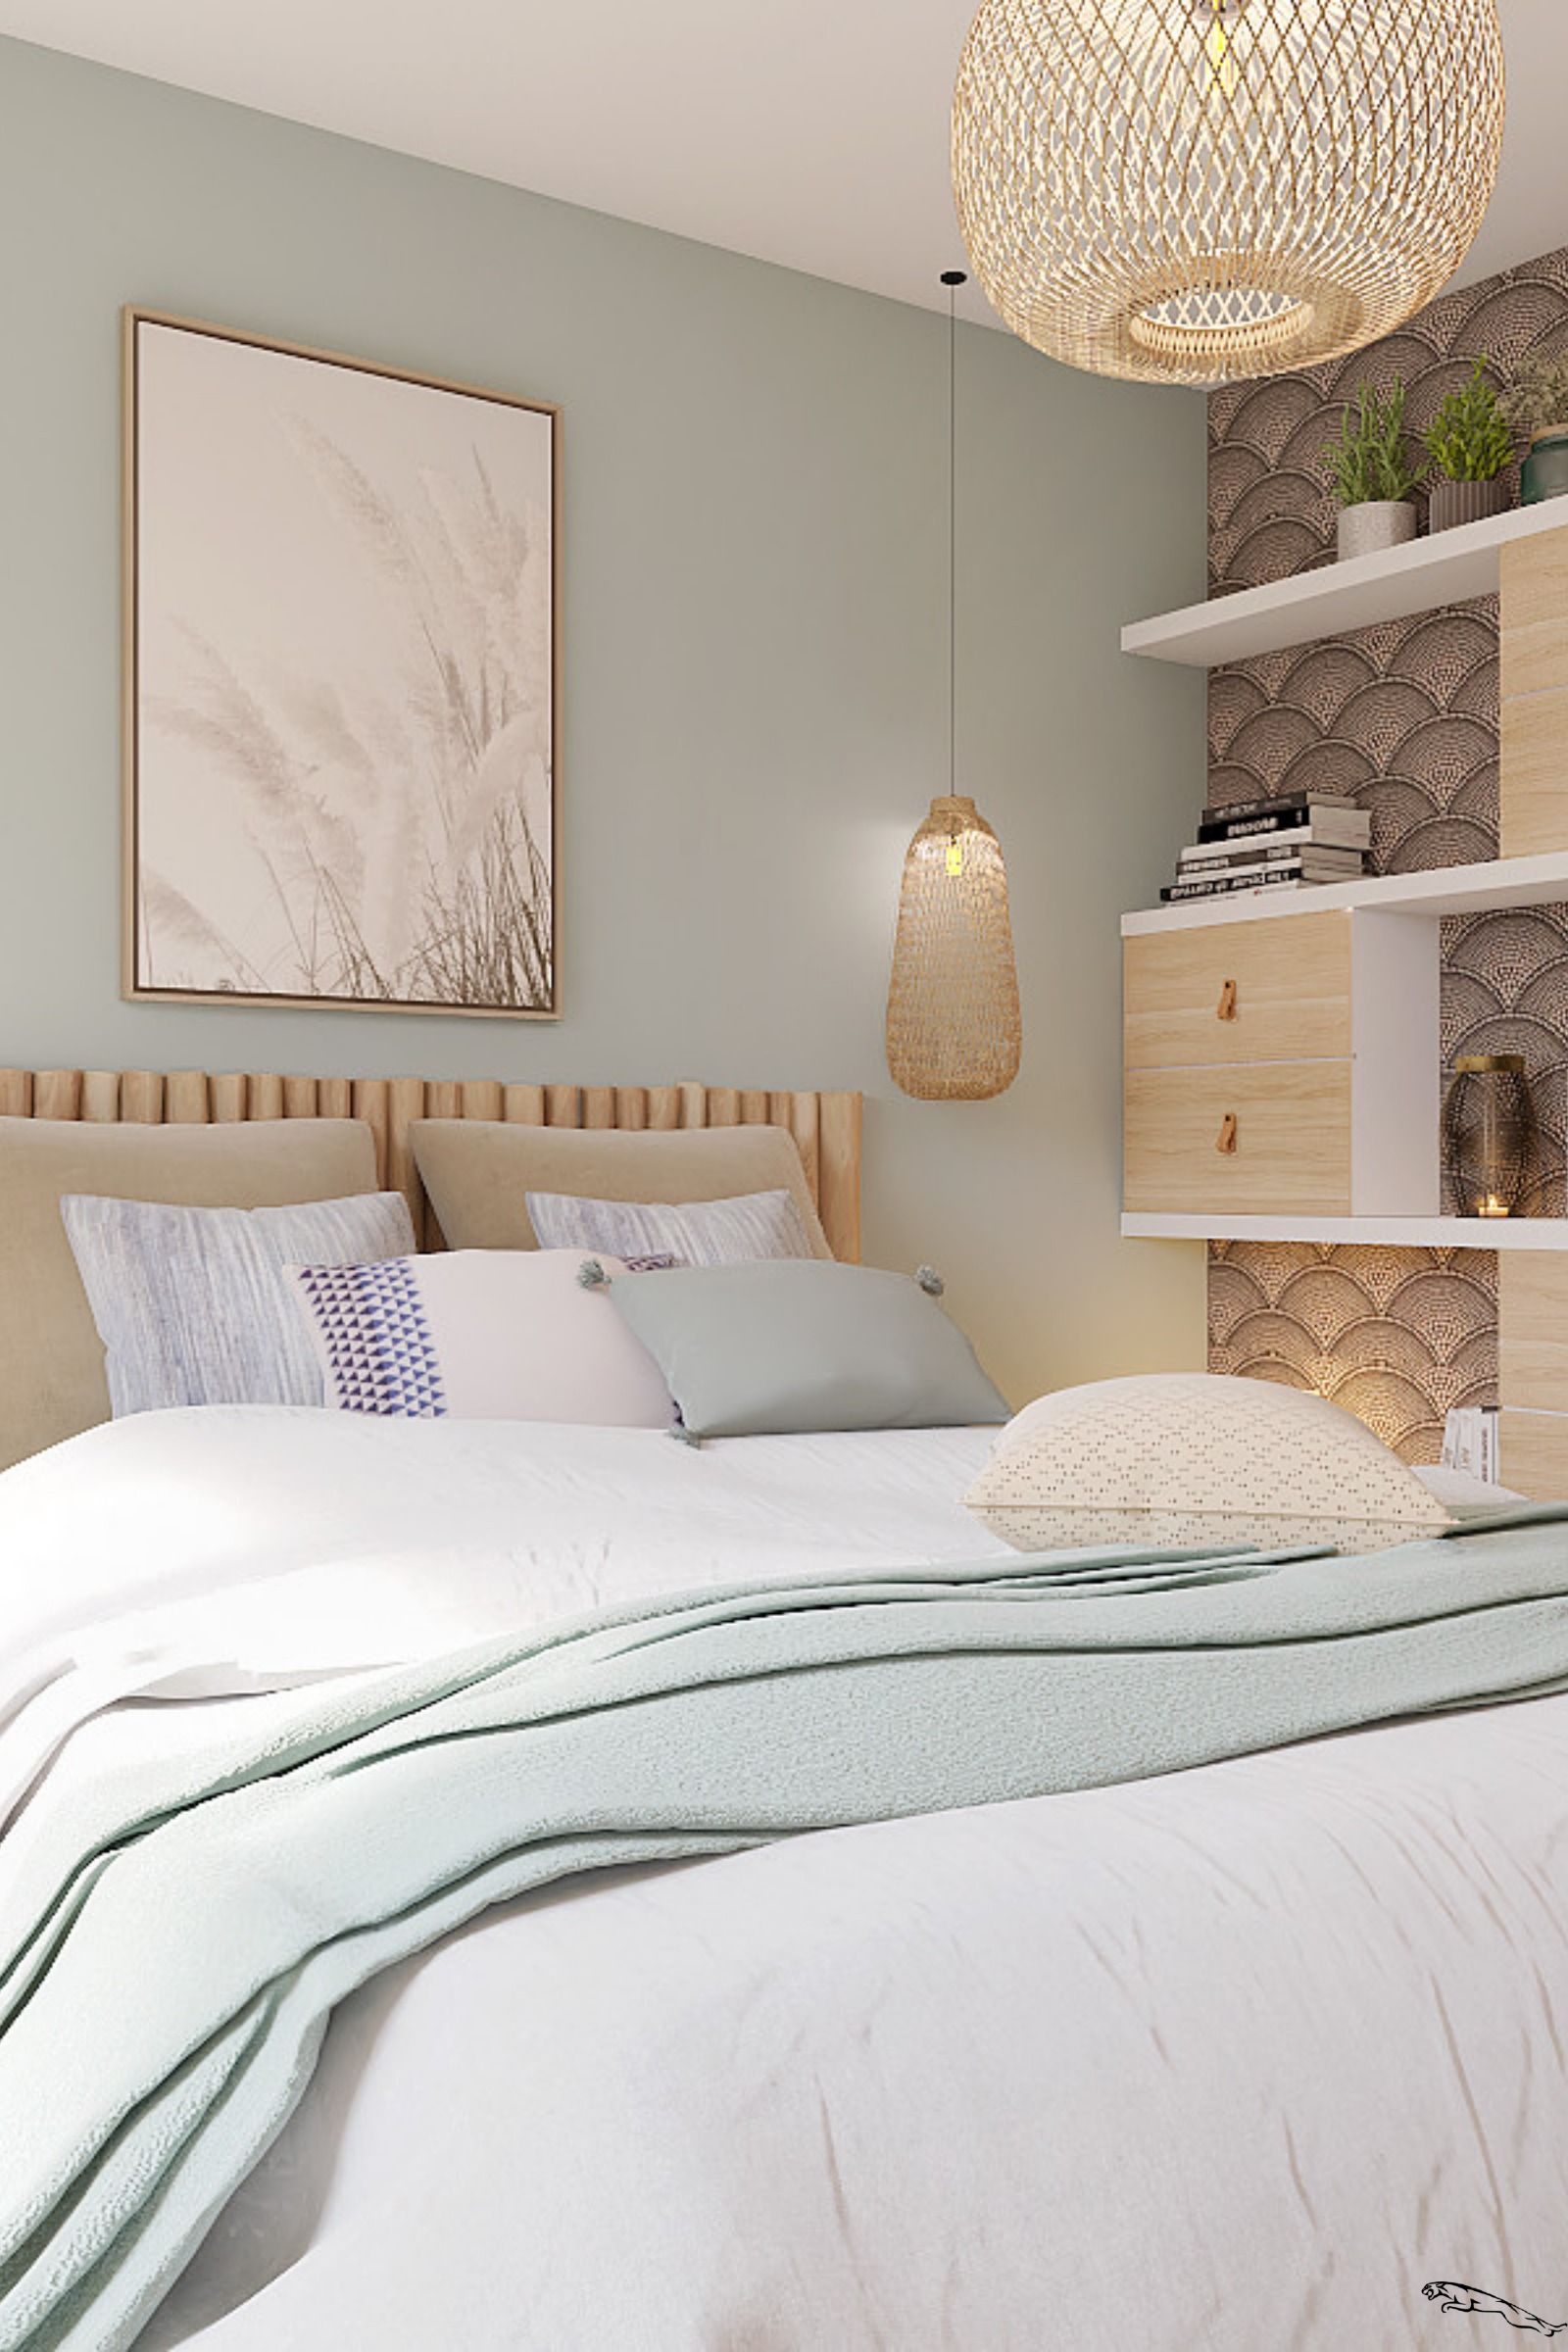 Chambre Style Bord De Mer Zuhausedekoration En 2020 Deco